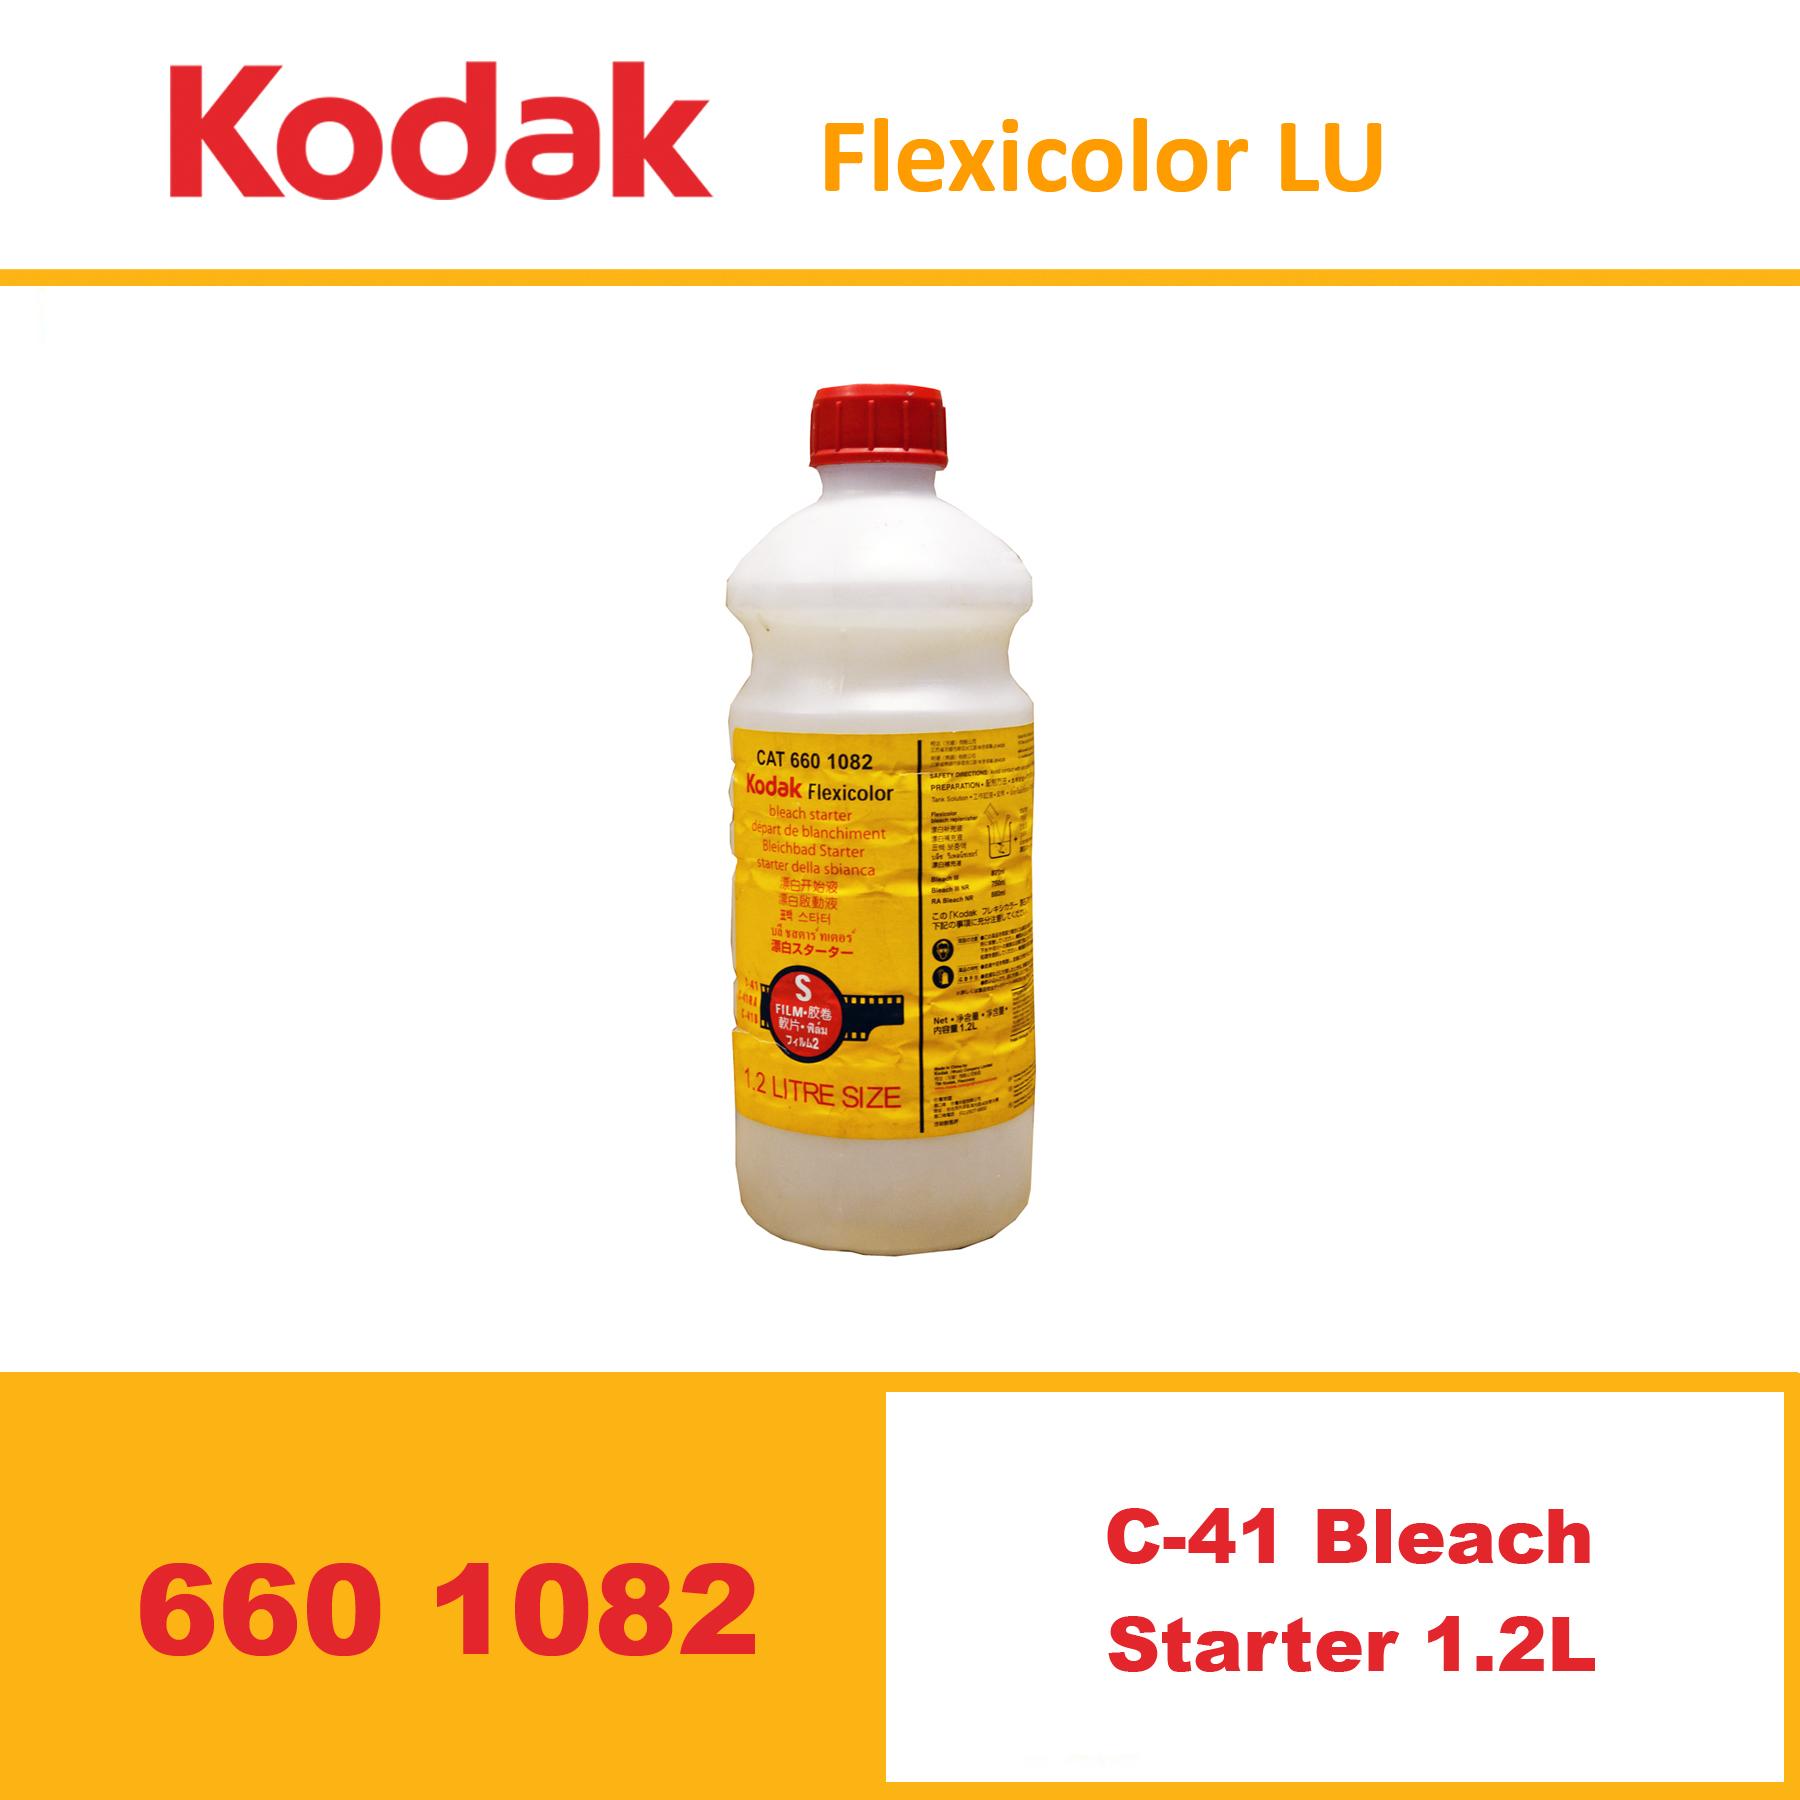 Kodak 1.2L Flex color (C-41) Bleach Starter for Color Negative Film